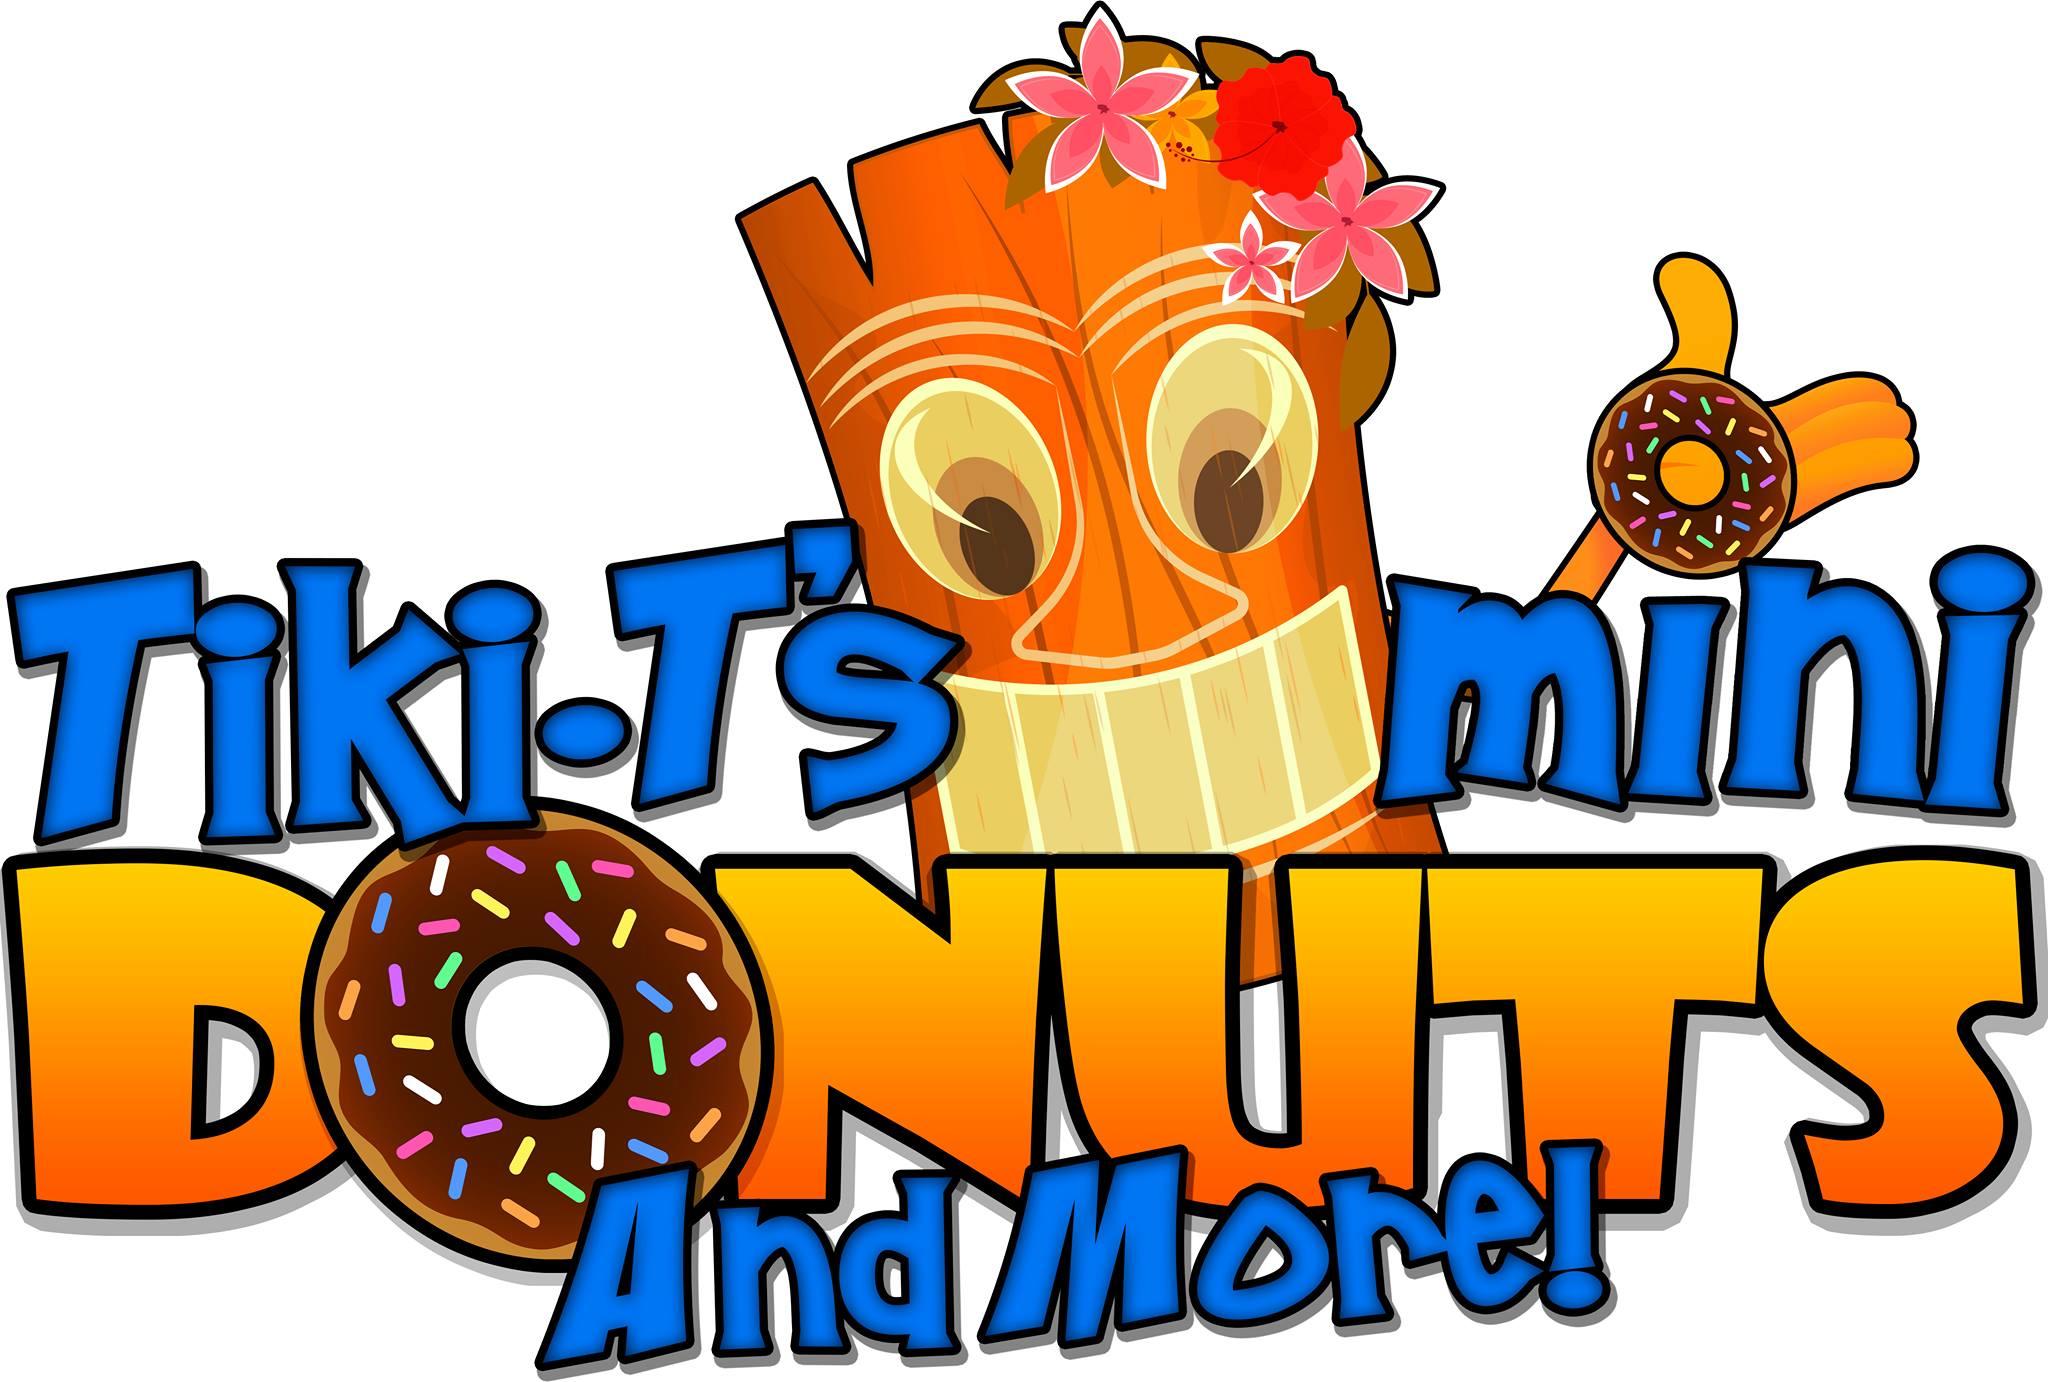 East Coast Mini Donuts food truck profile image